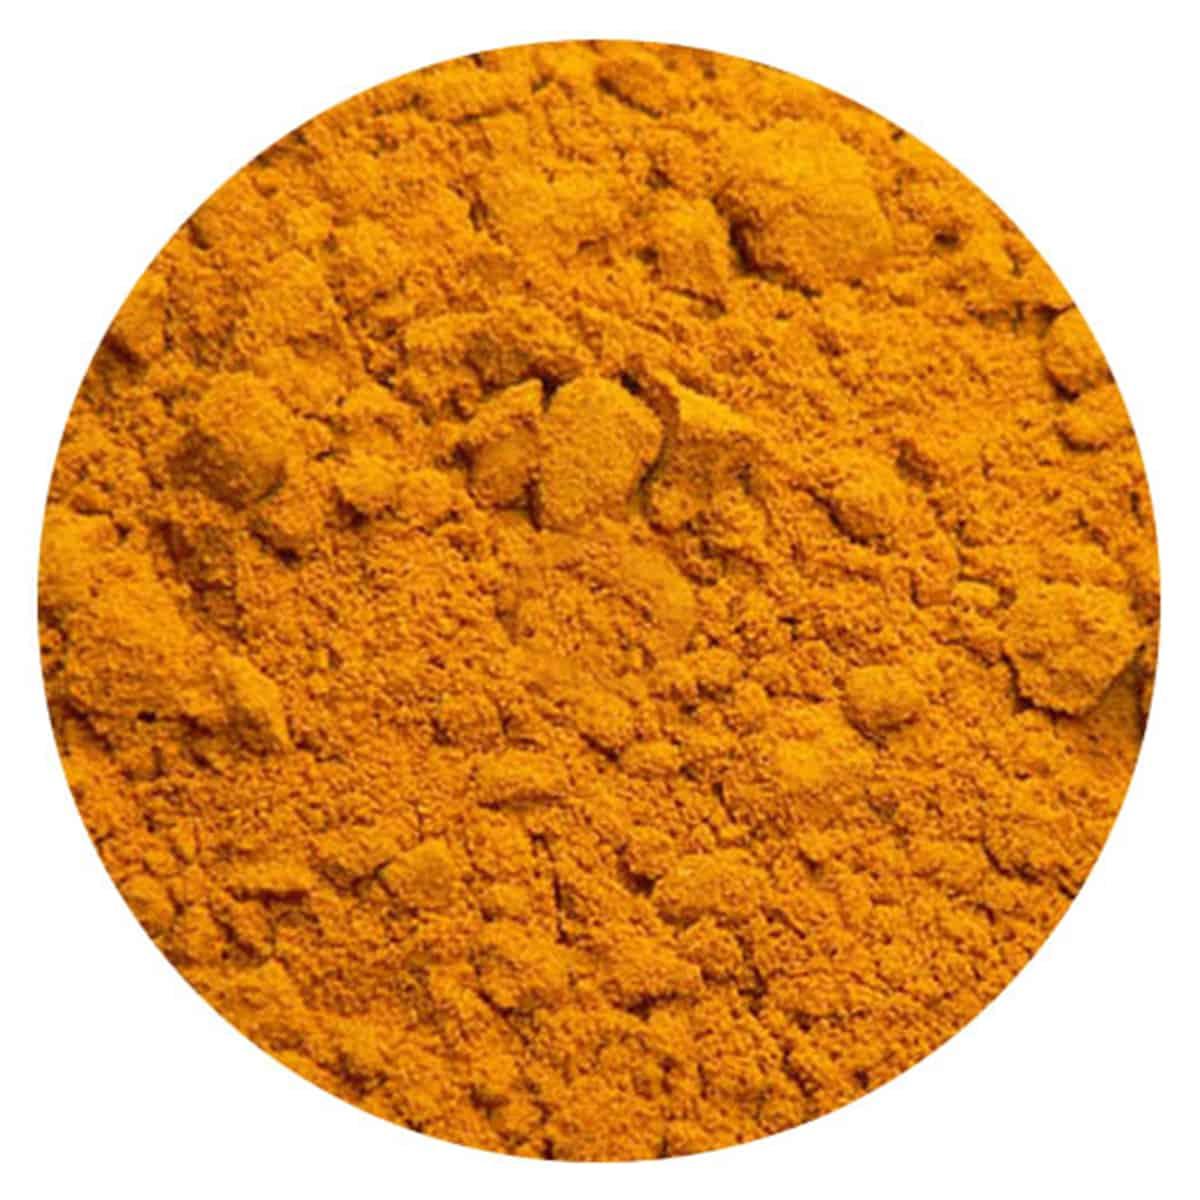 Buy IAG Foods Turmeric Powder - 1 kg